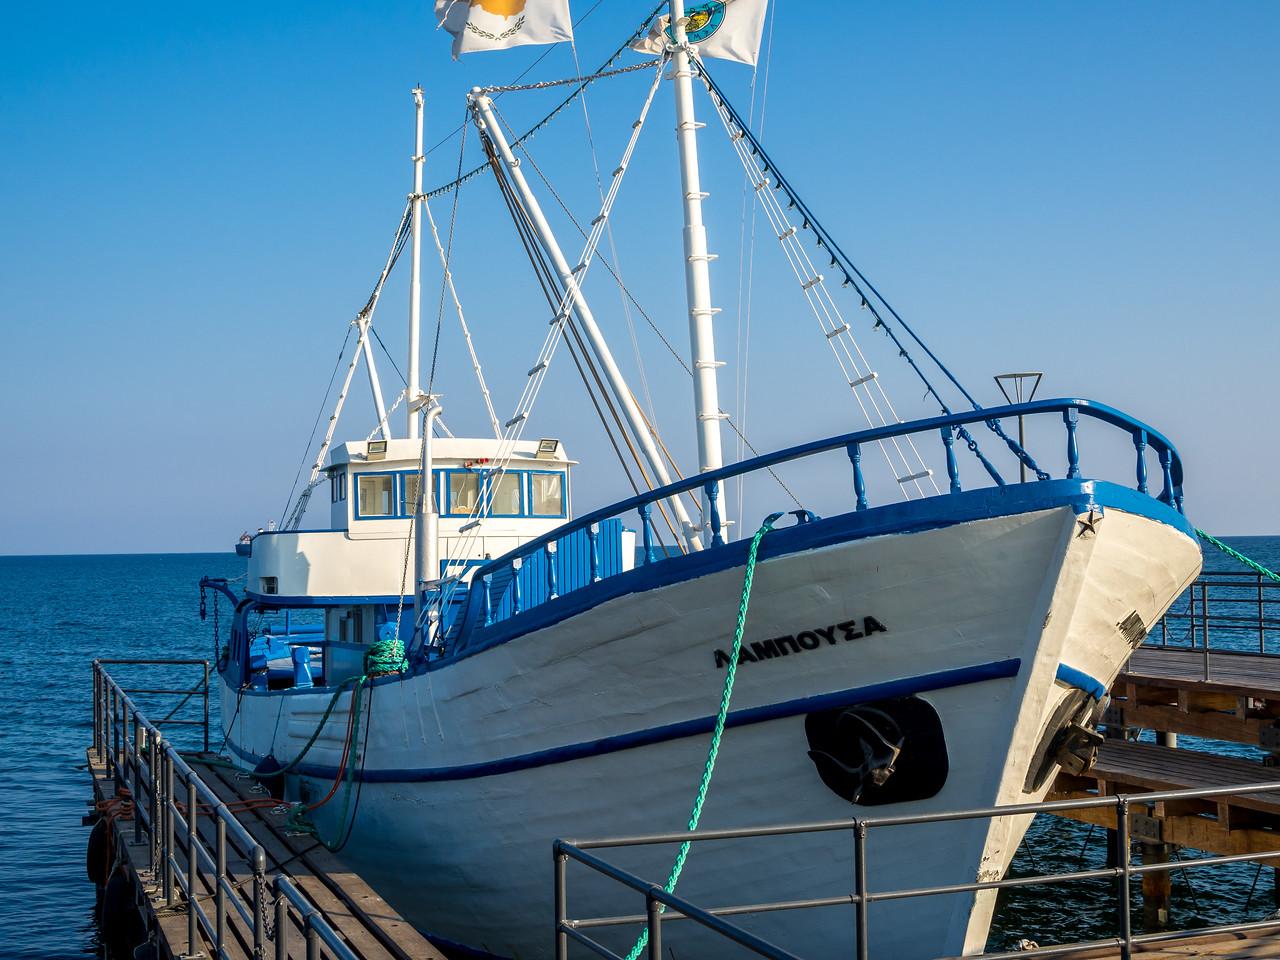 A ship in Limassol